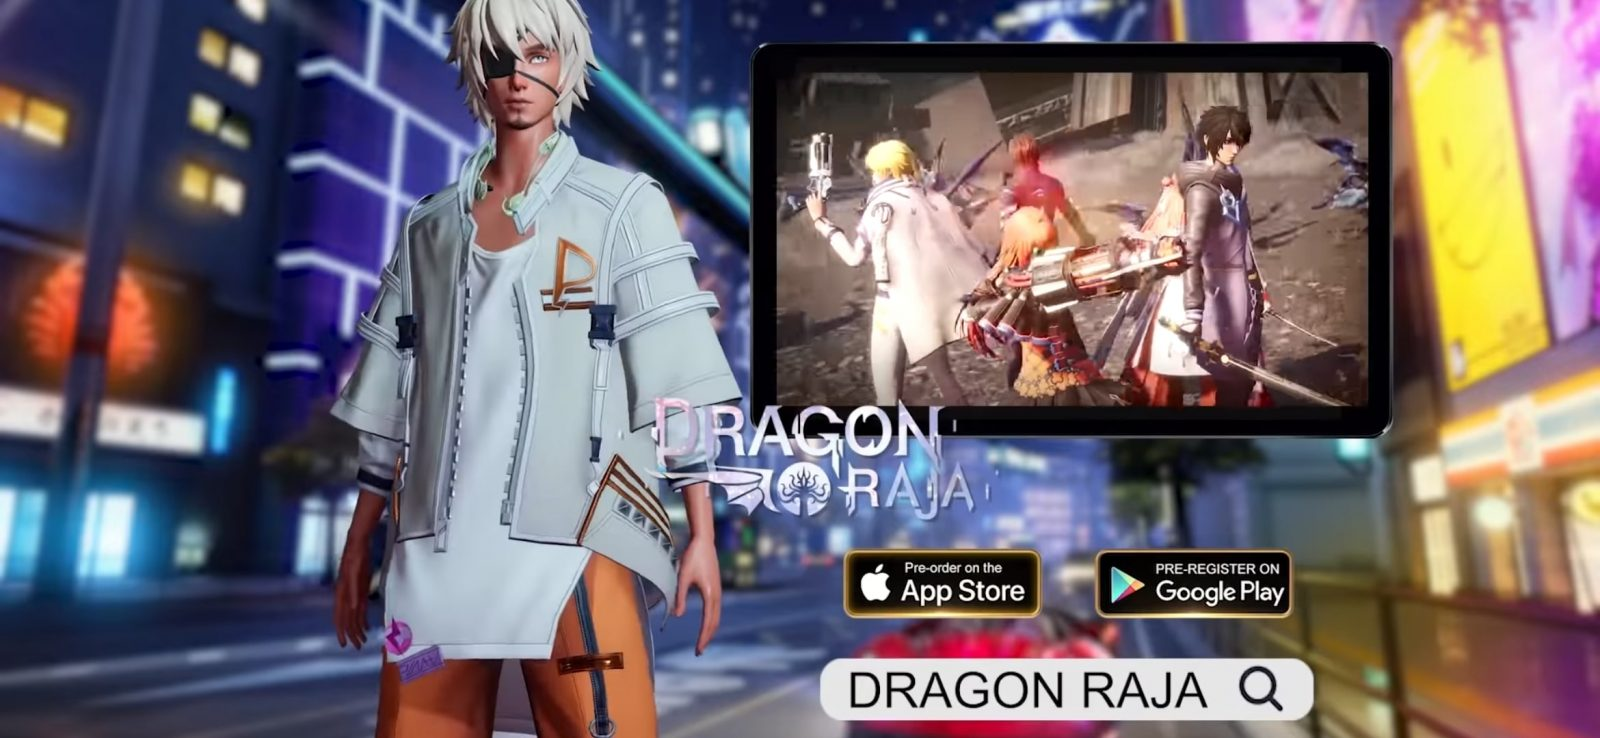 27 февраля выход новой MMORPG - Dragon Raja